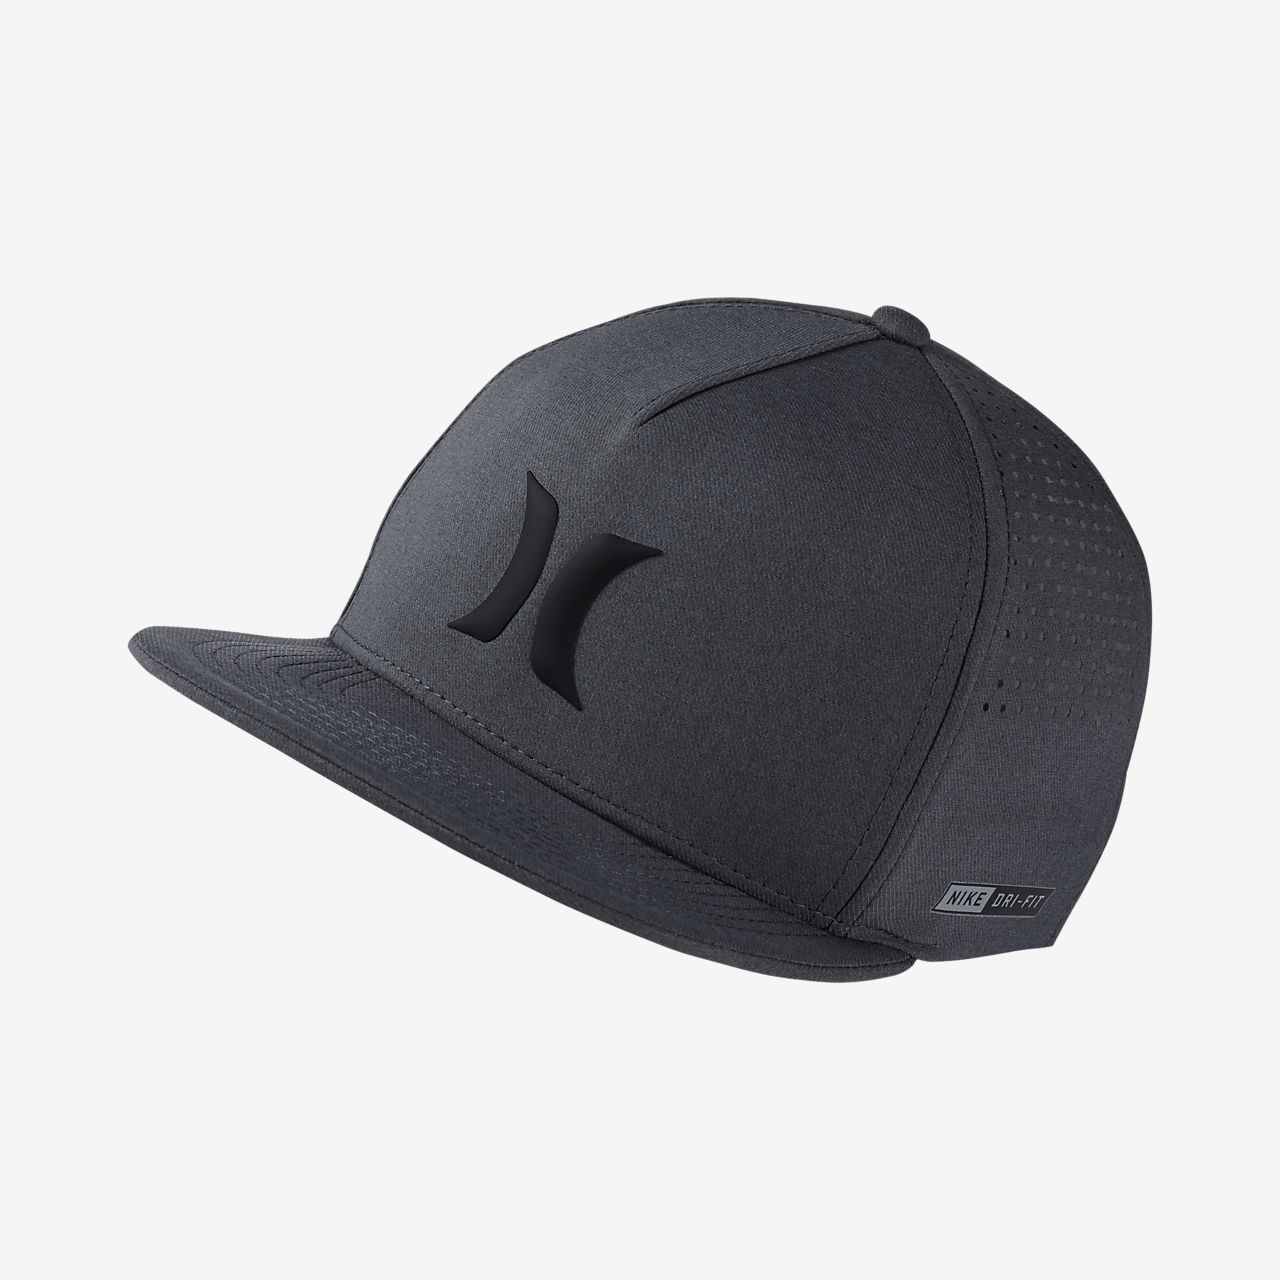 Hurley Dri-FIT Icon Men s Adjustable Hat. Nike.com NO 8c4bada2abc